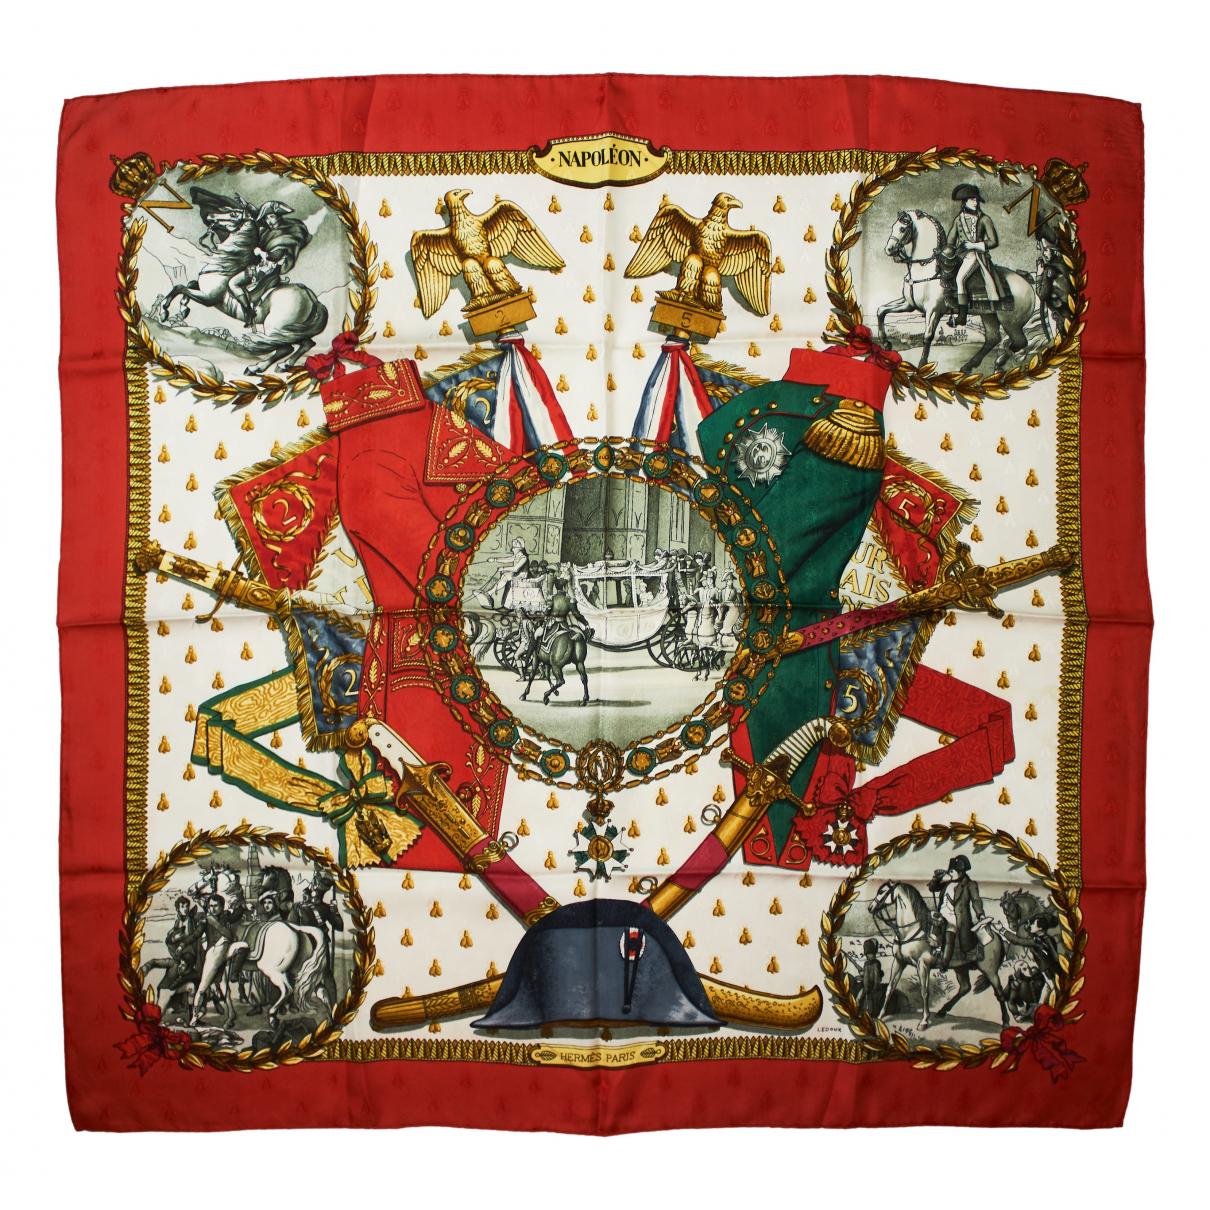 Pañuelo Carre Geant silk 86 de Seda Hermes